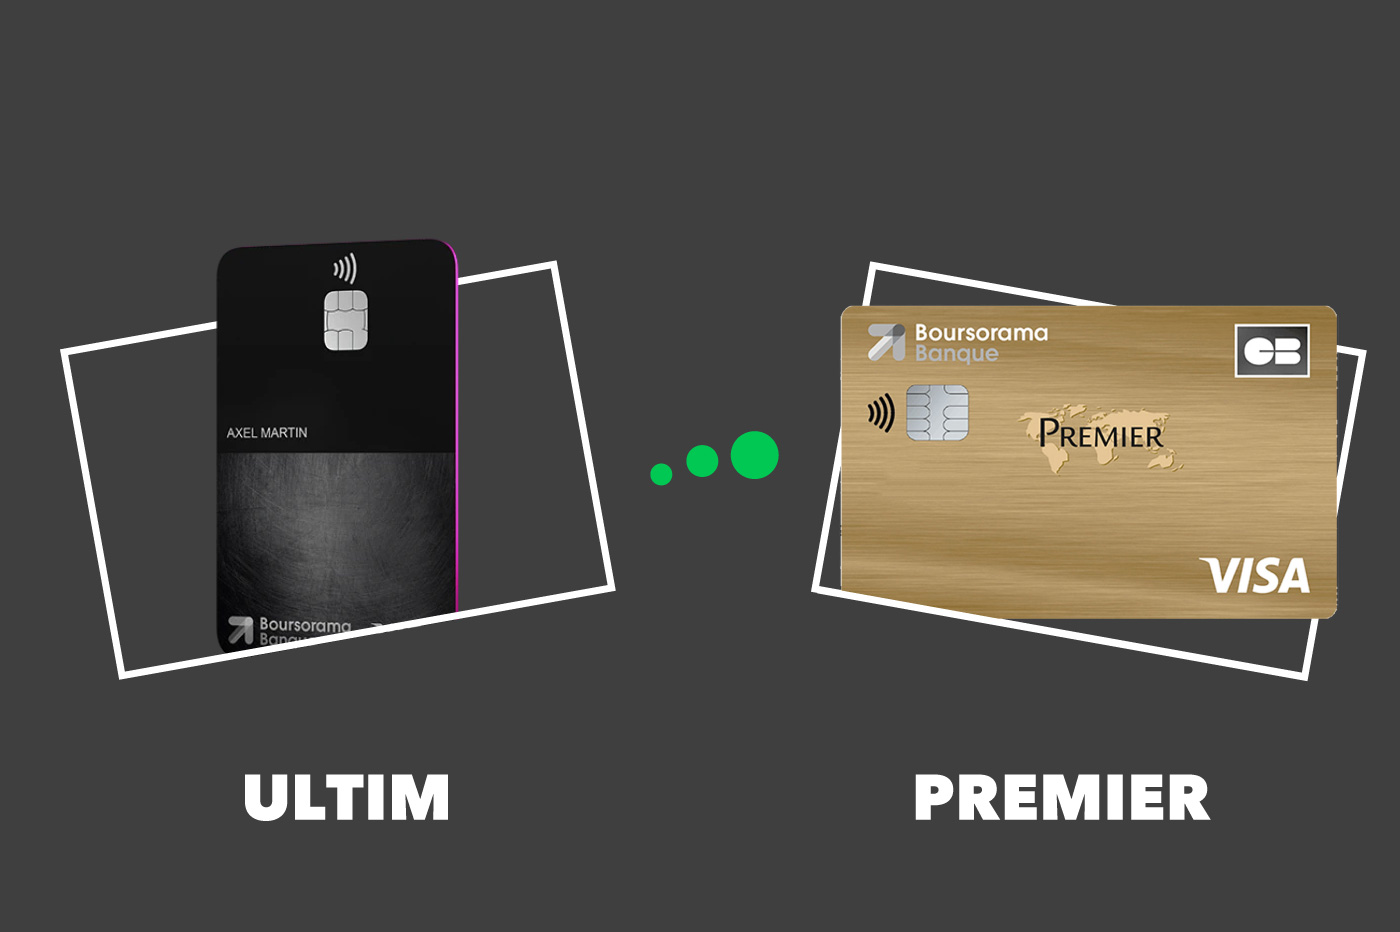 Carte Visa Ultim Vs Premier Comparatif Des Offres Boursorama